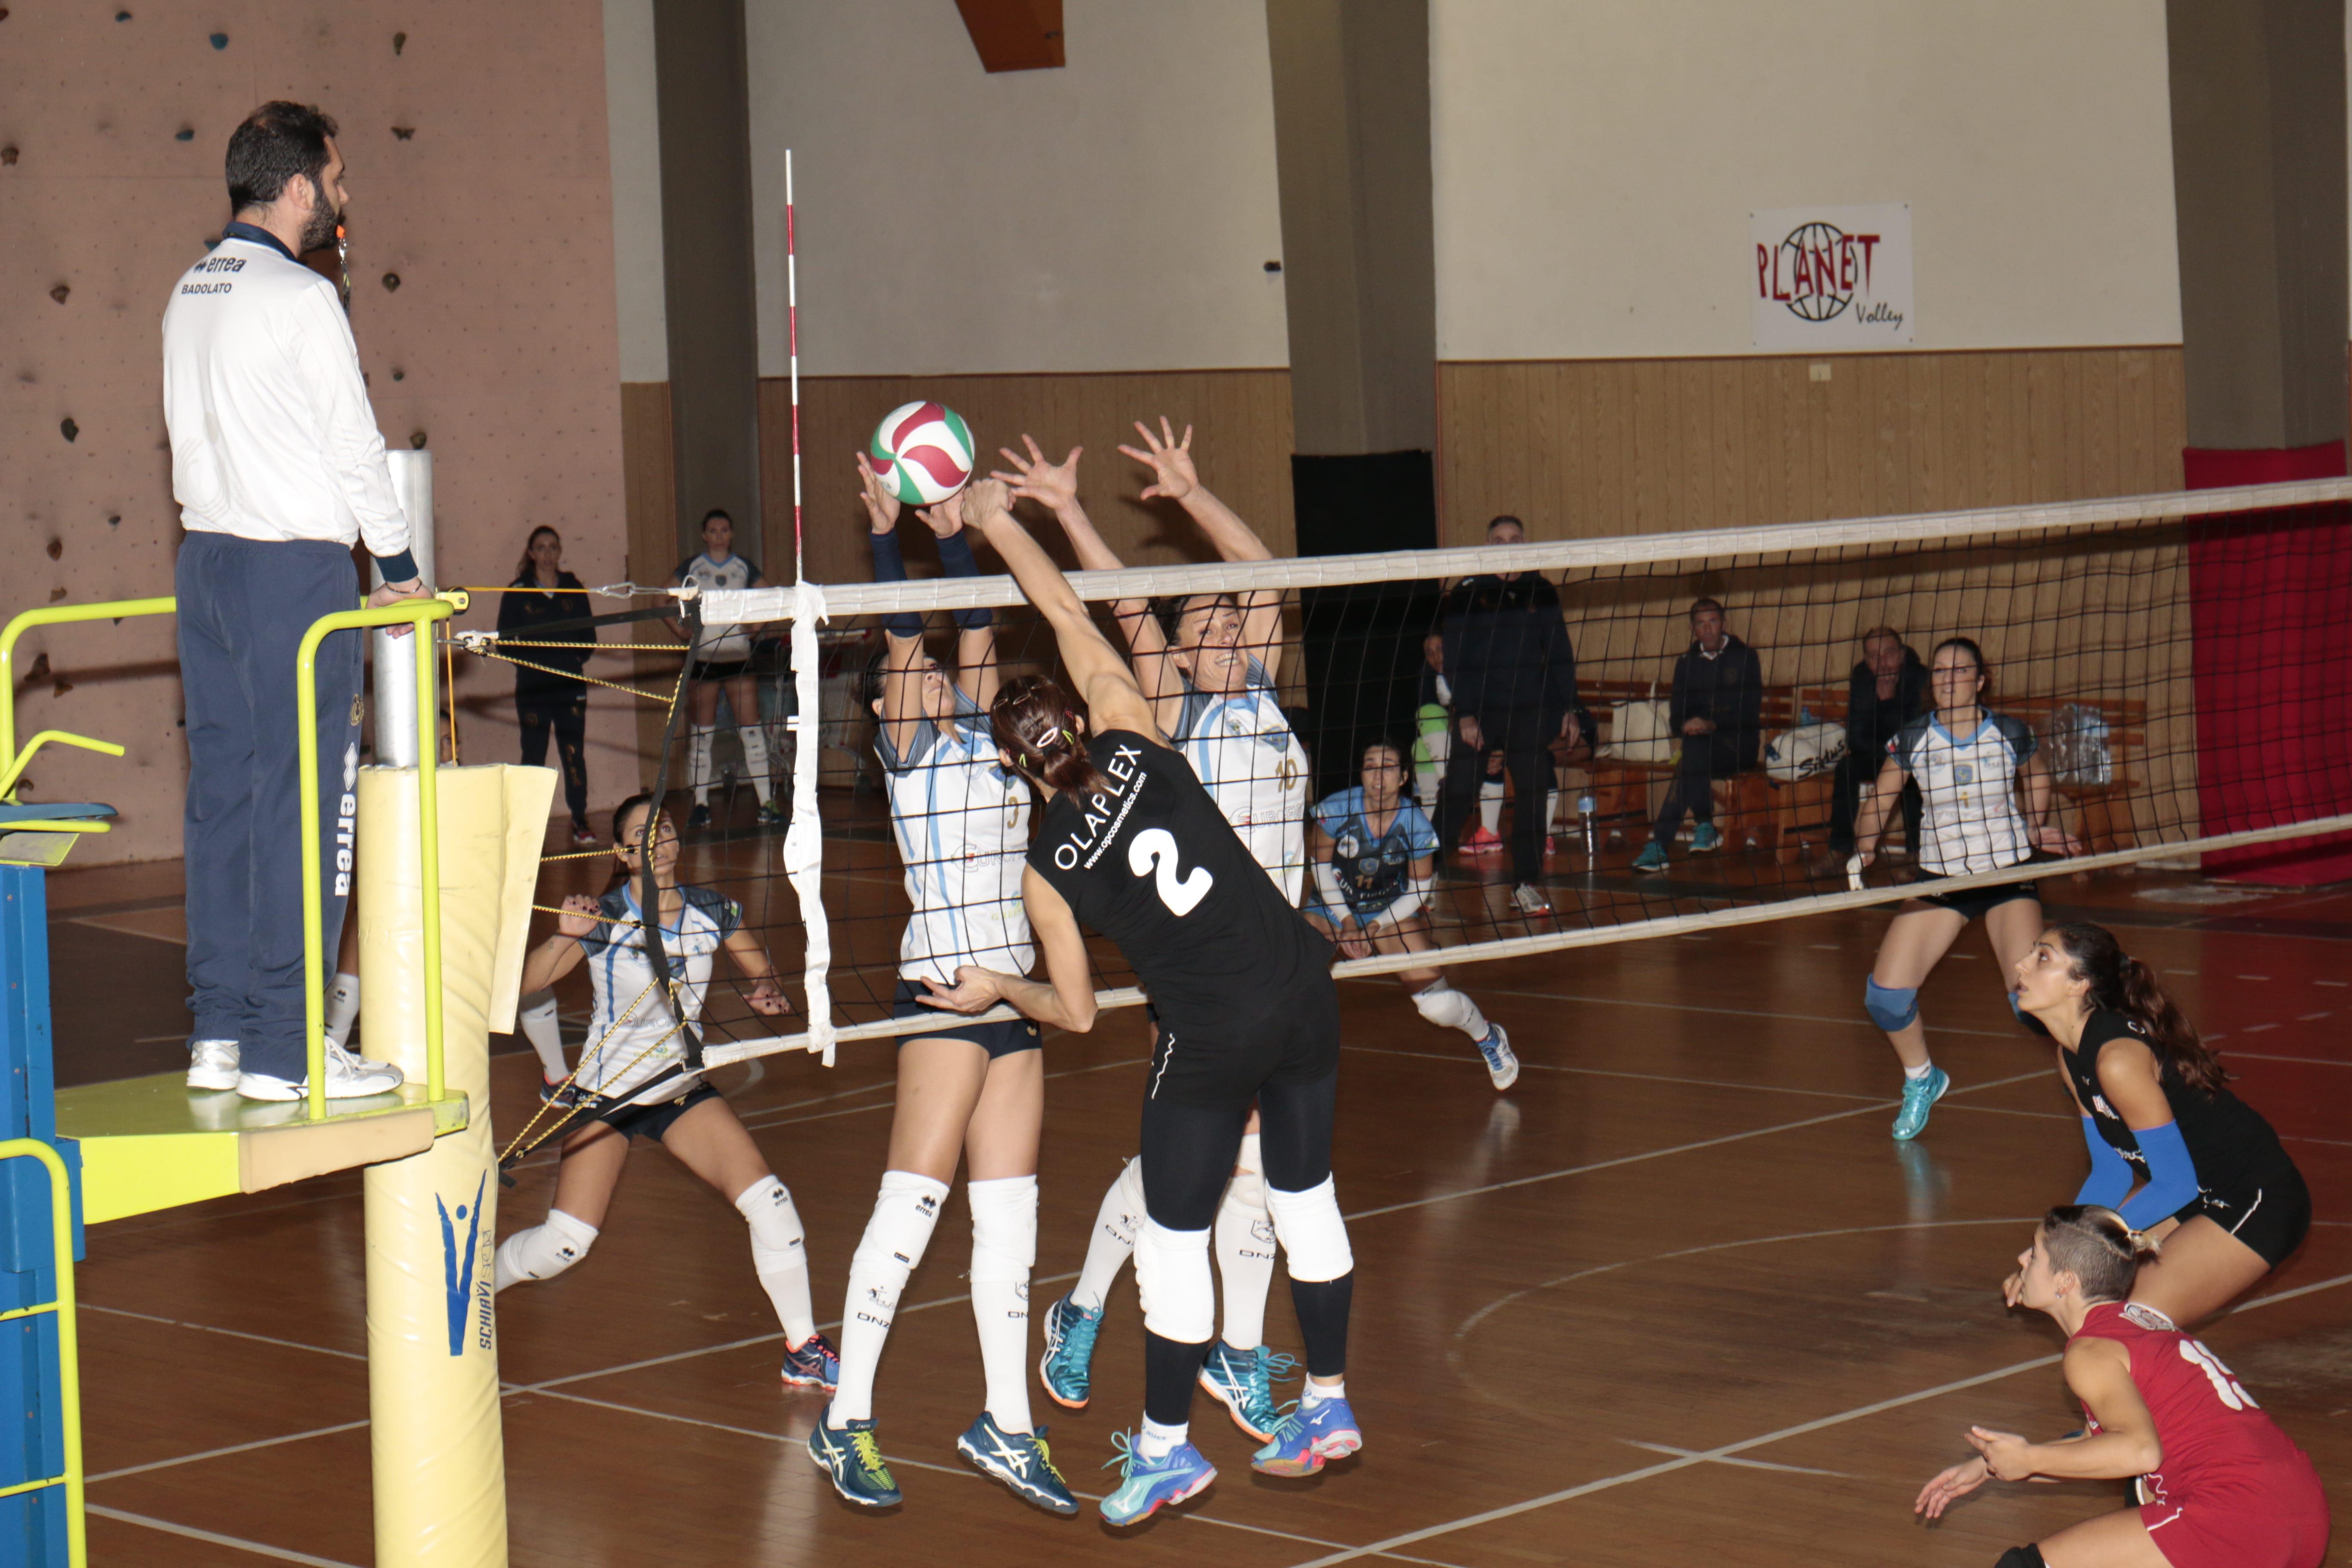 Partita Planet Volley - OP e lo sport